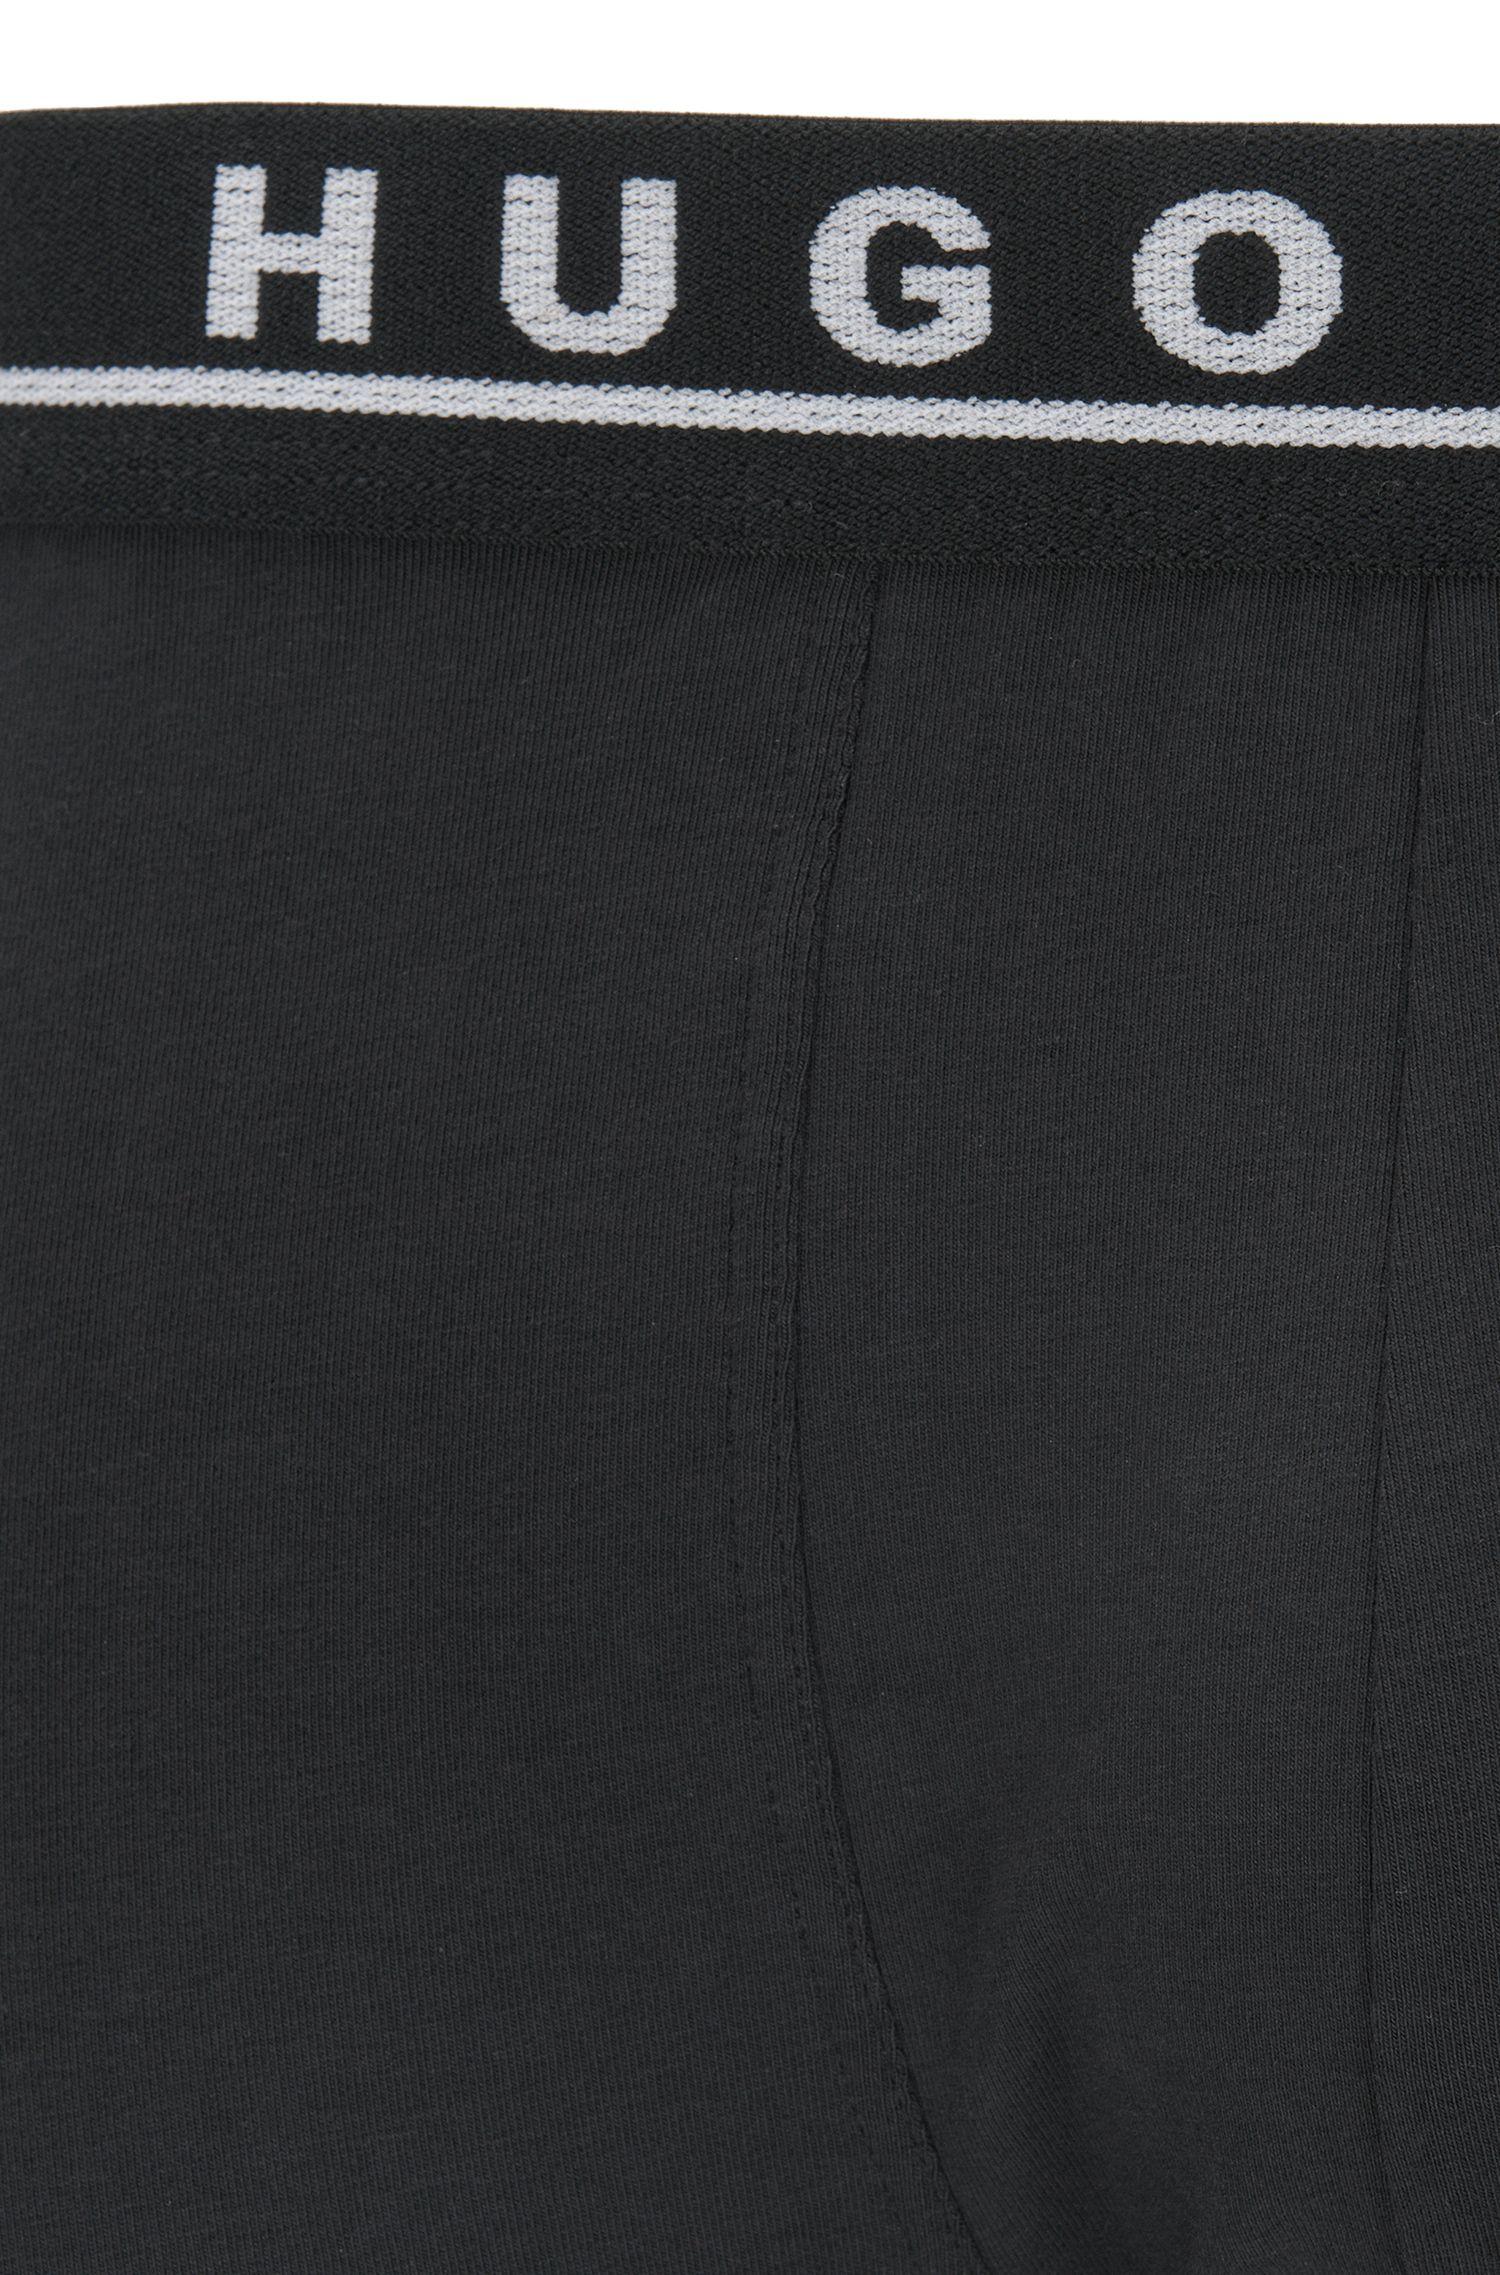 Stretch Cotton Trunks, 3 Pack | Trunk 3P One Design